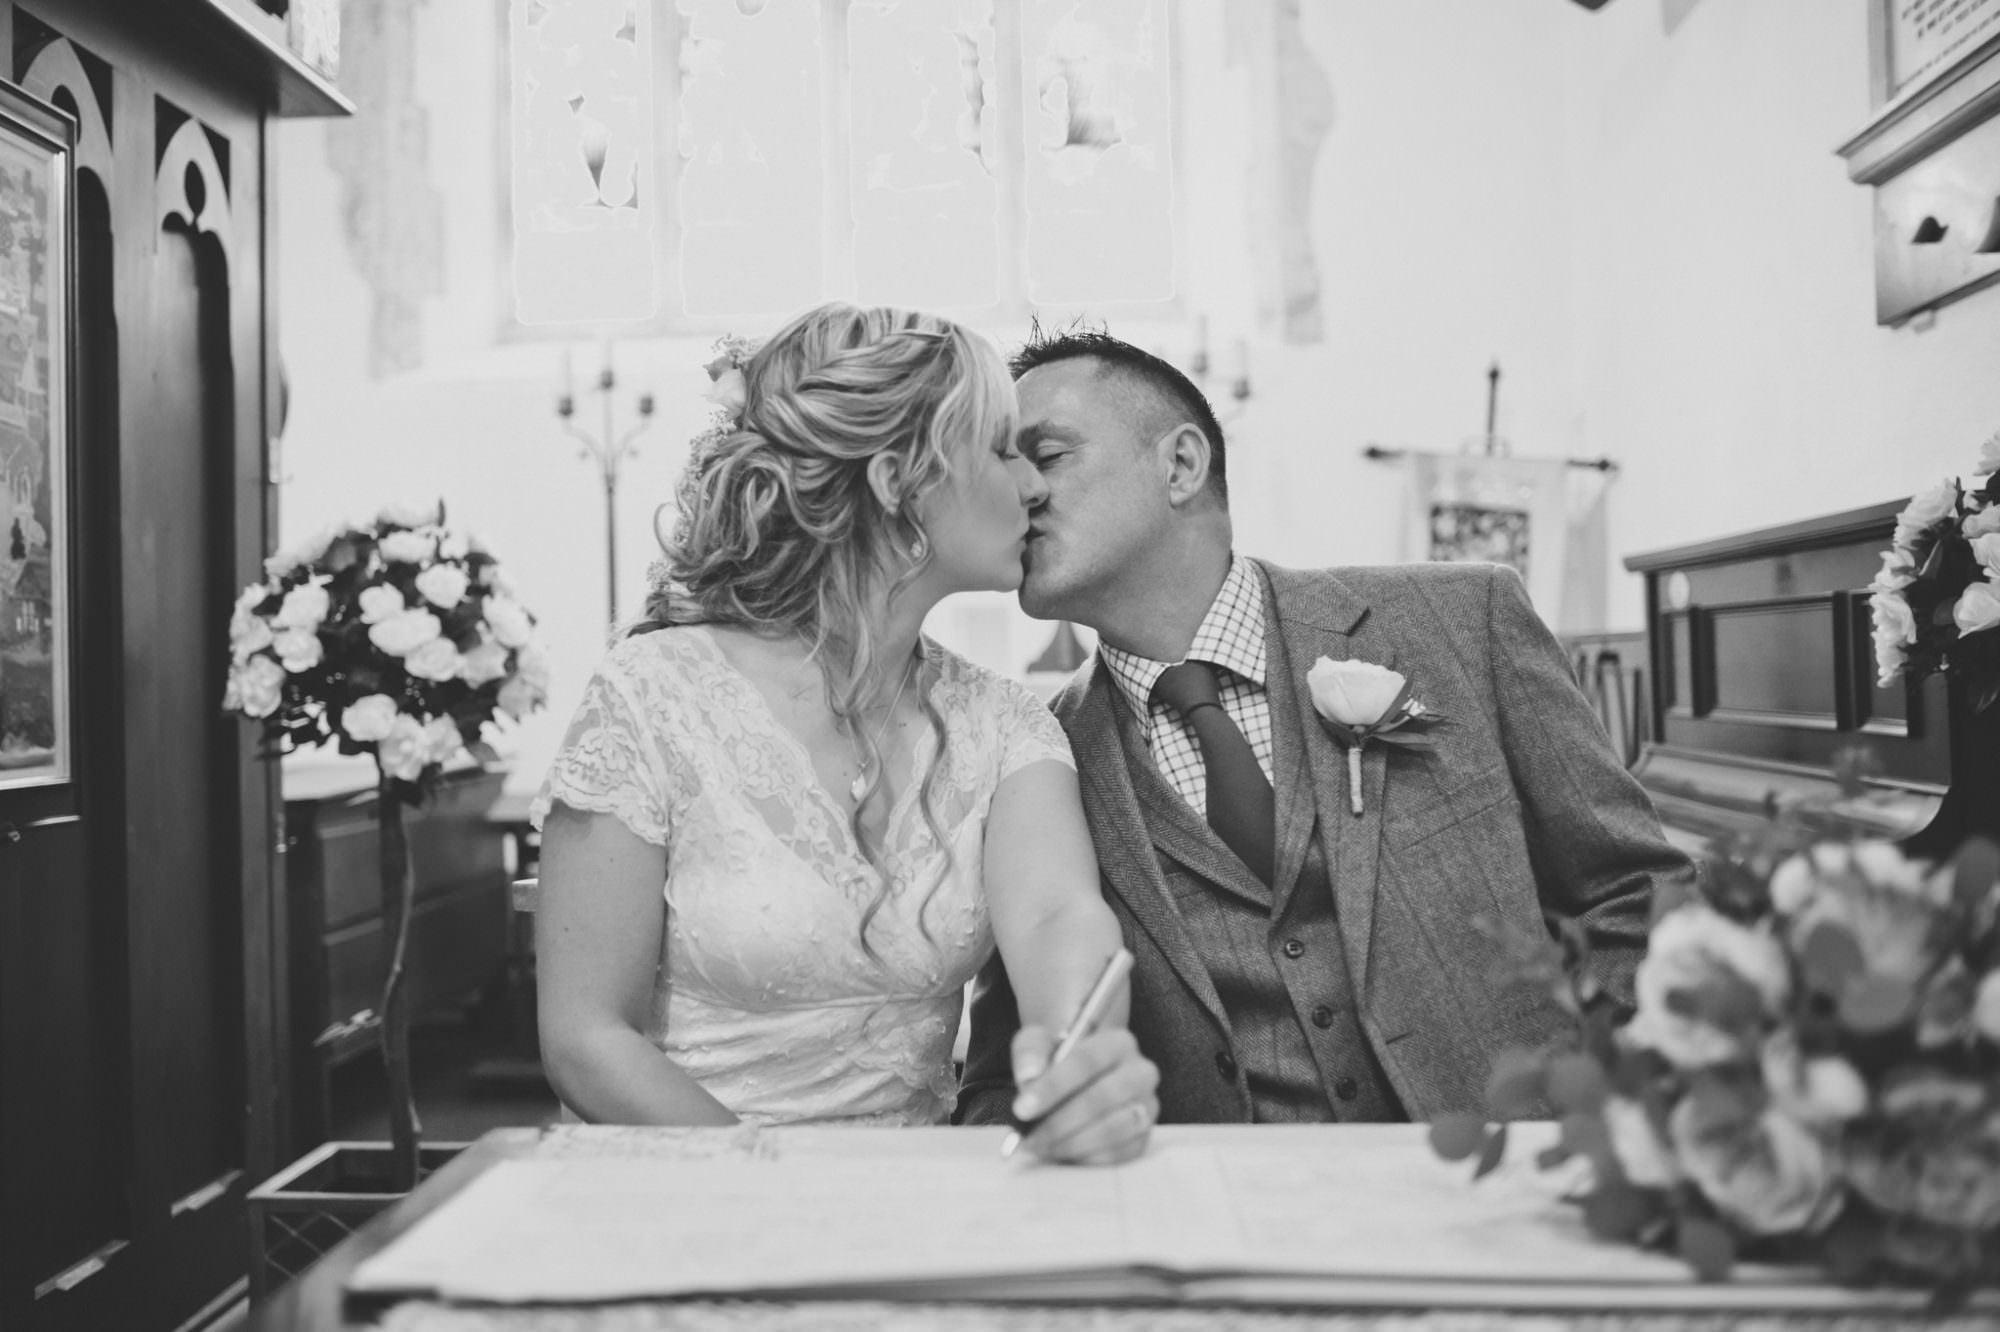 Signing wedding register at Sopley Church